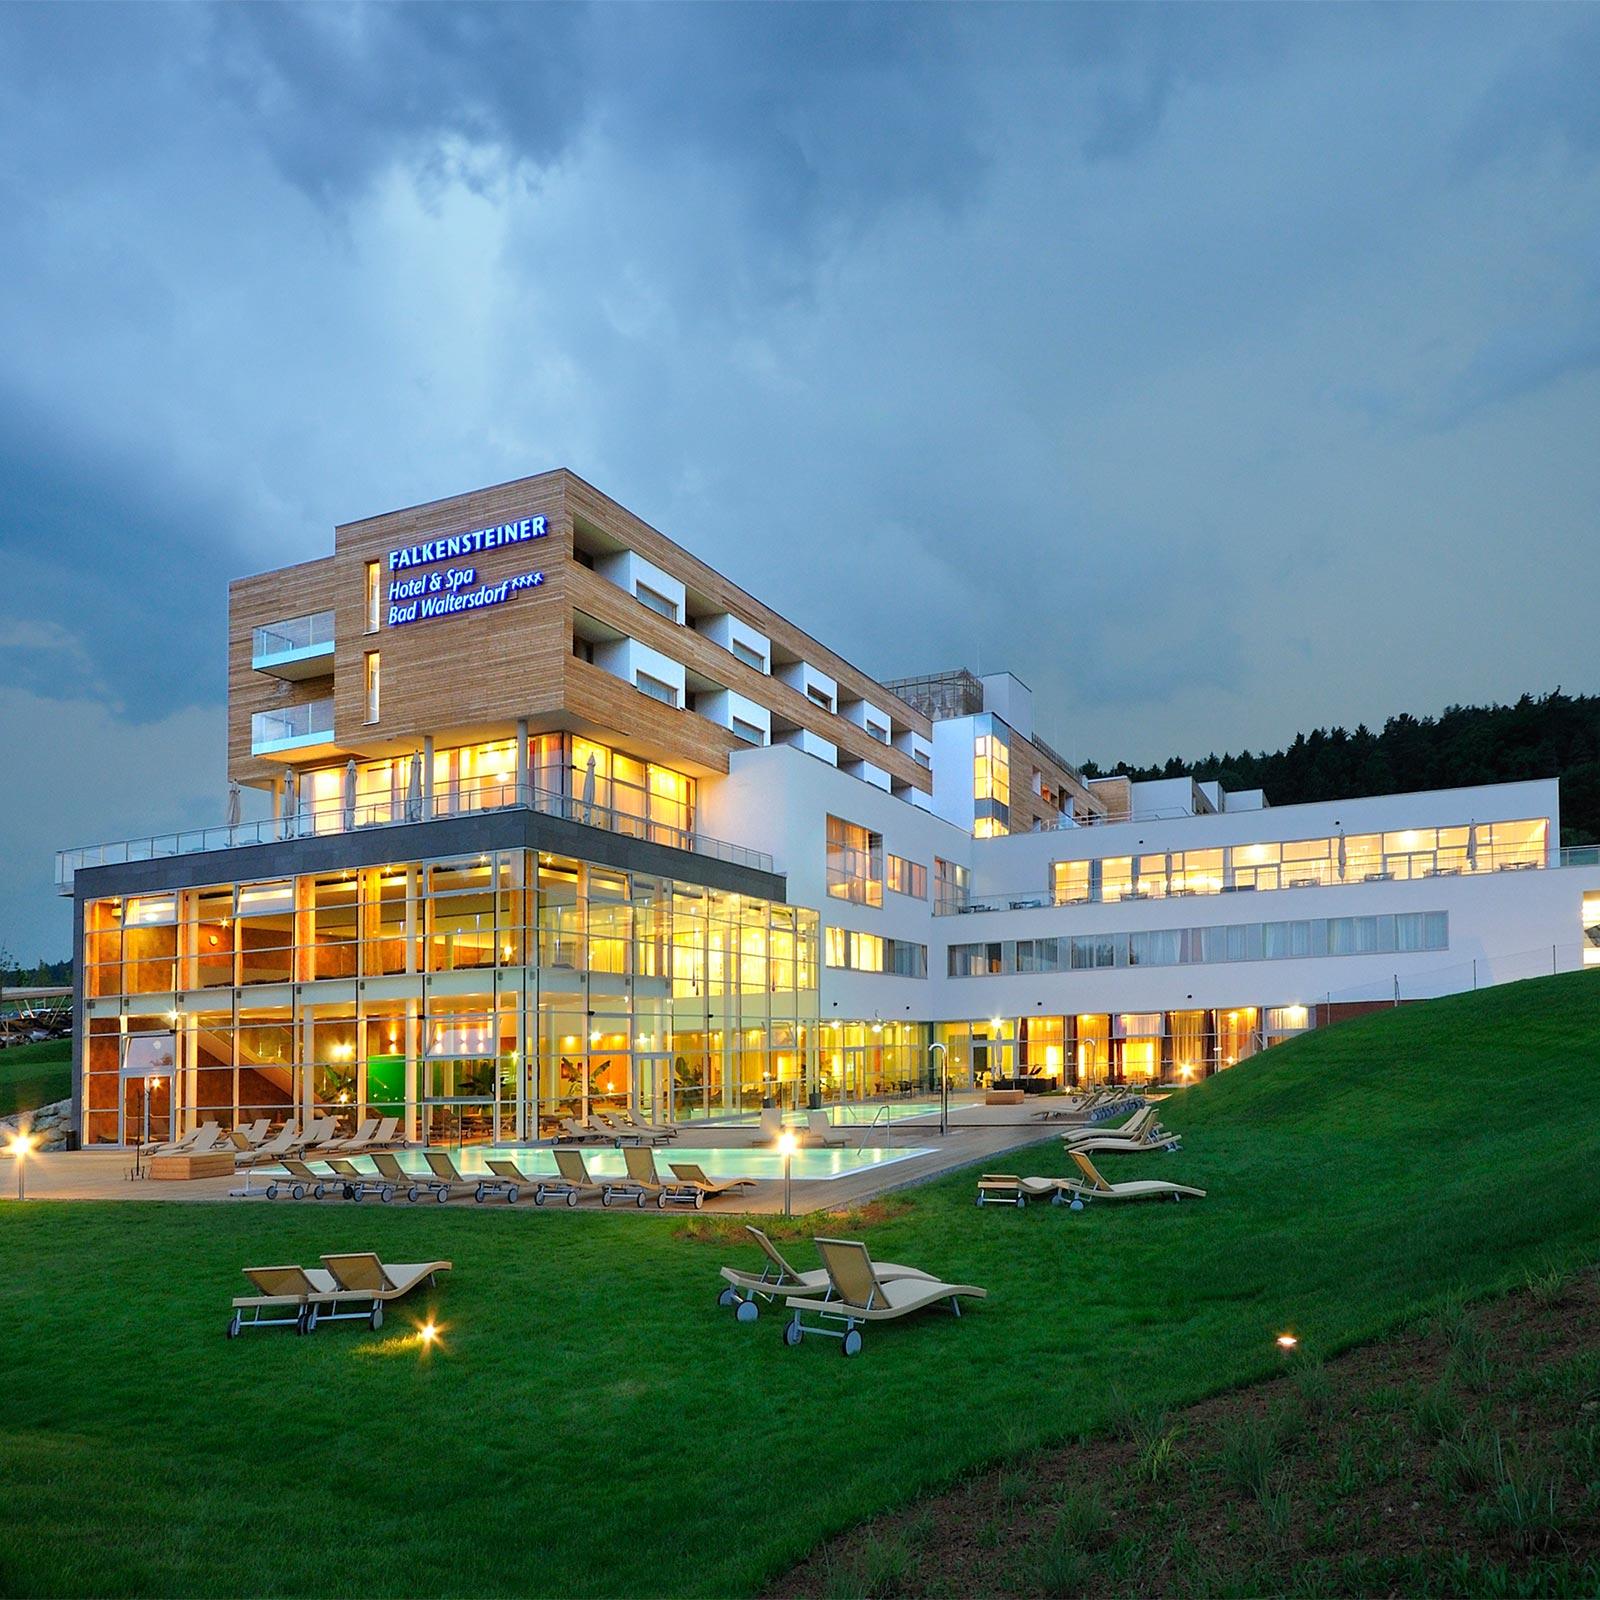 Falkensteiner Therme & Golf Hotel Bad Waltersdorf